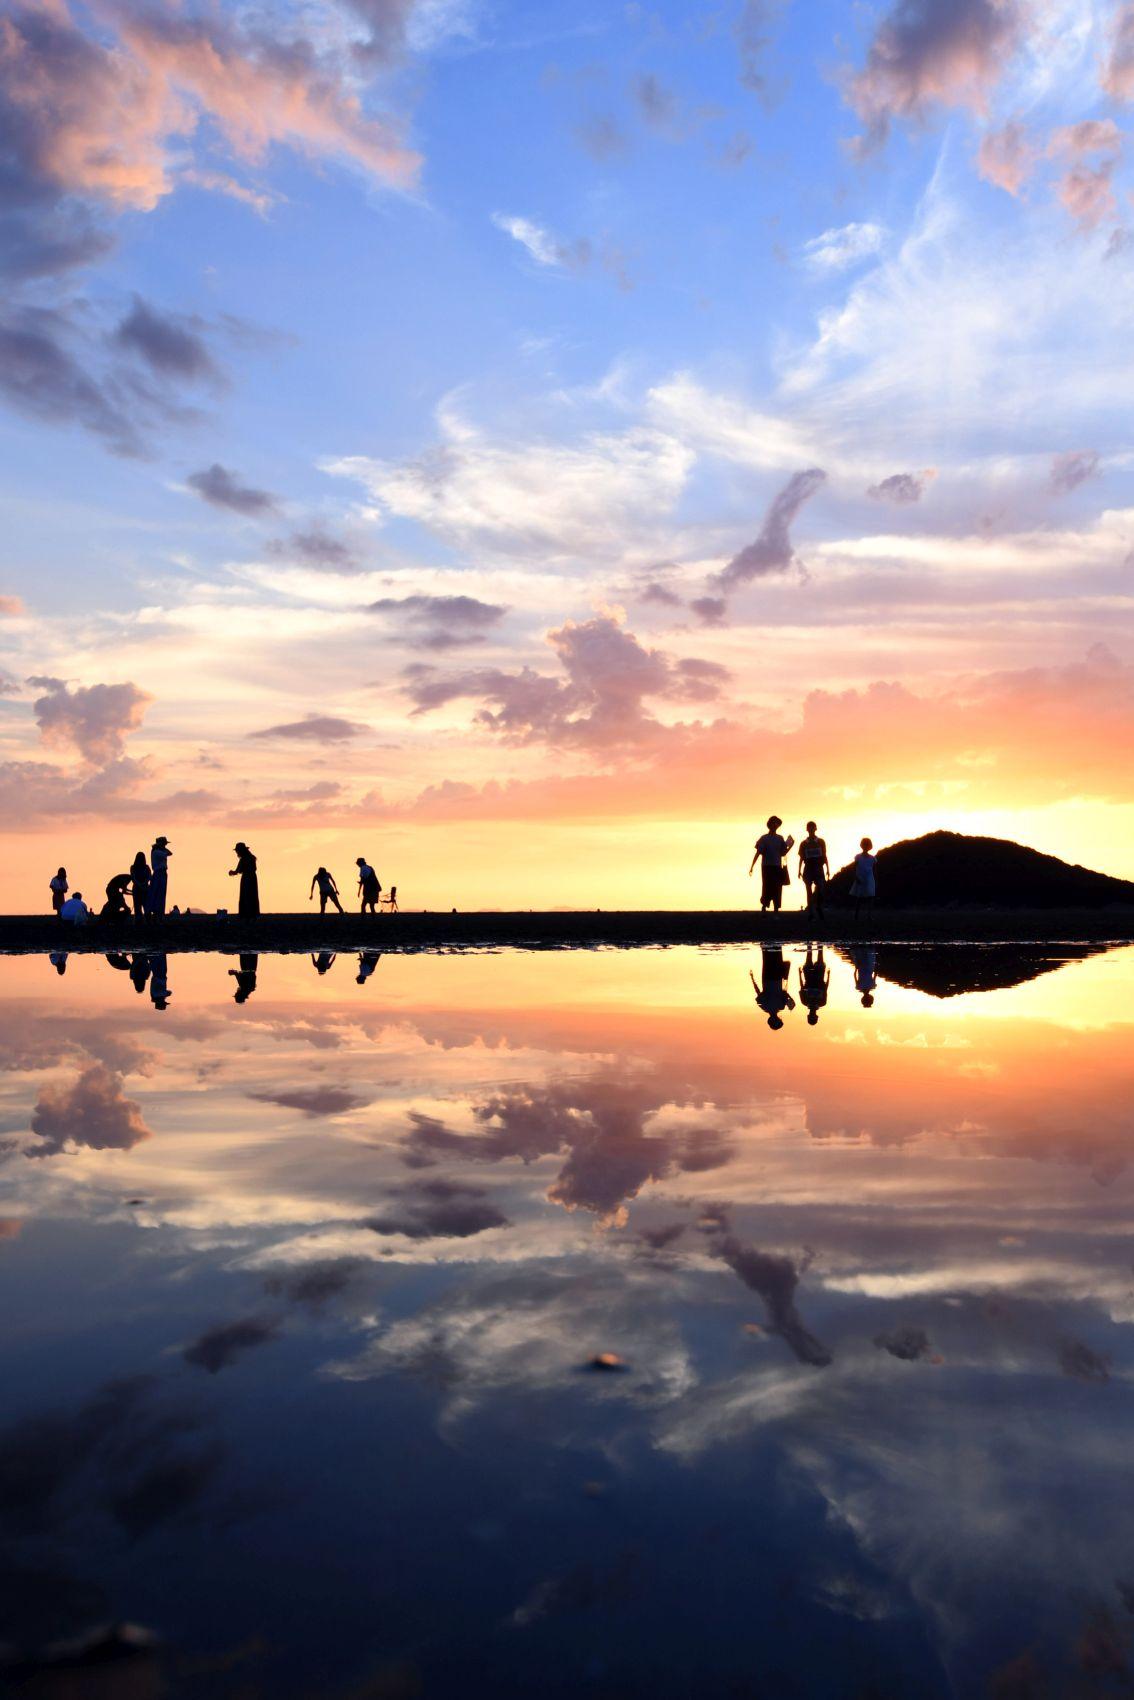 Chichibugahama Beach: The New Photo-Perfect, Favorite Destination in Japan